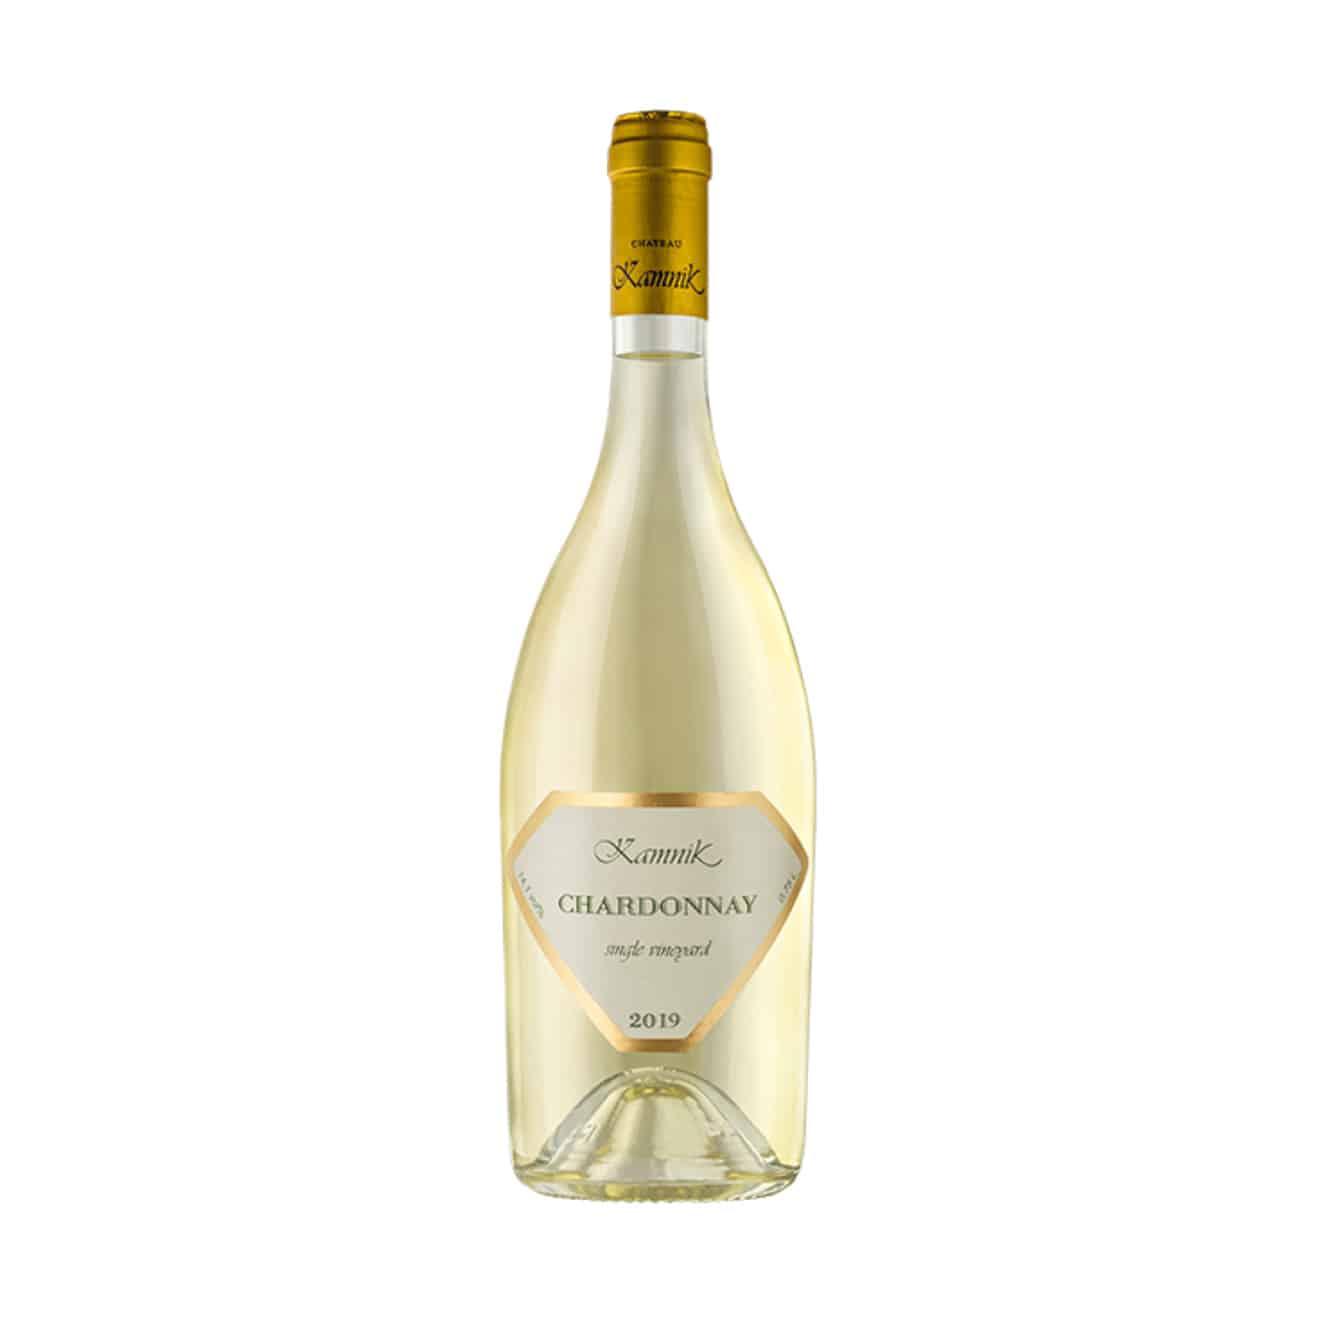 Chateau Kamnik Chardonnay 2019